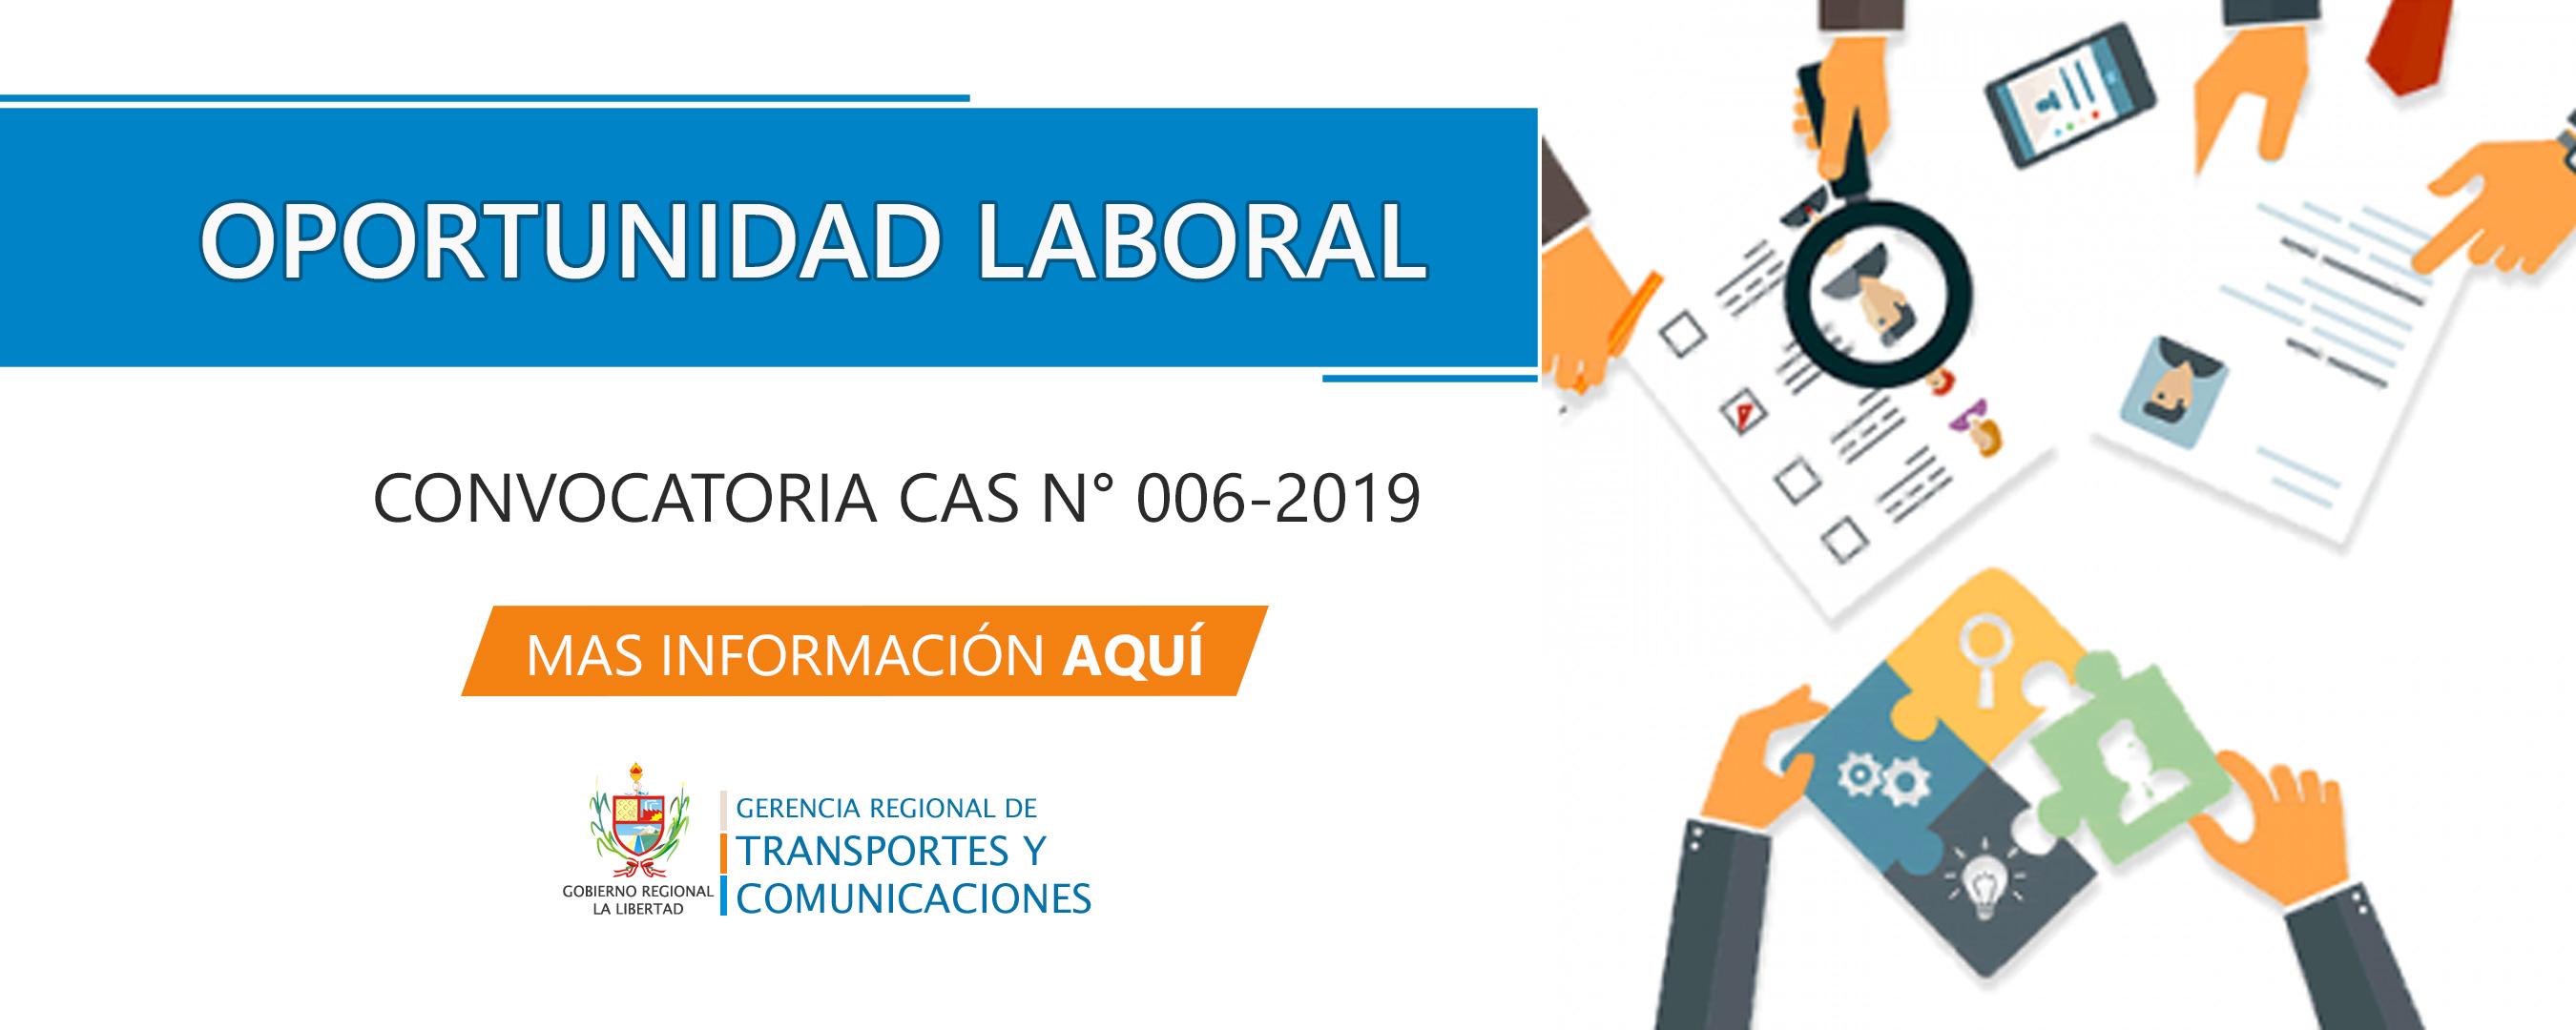 http://www.grtclalibertad.gob.pe/wp-content/uploads/2019/11/Convocatoria_CAS006-2019.jpg